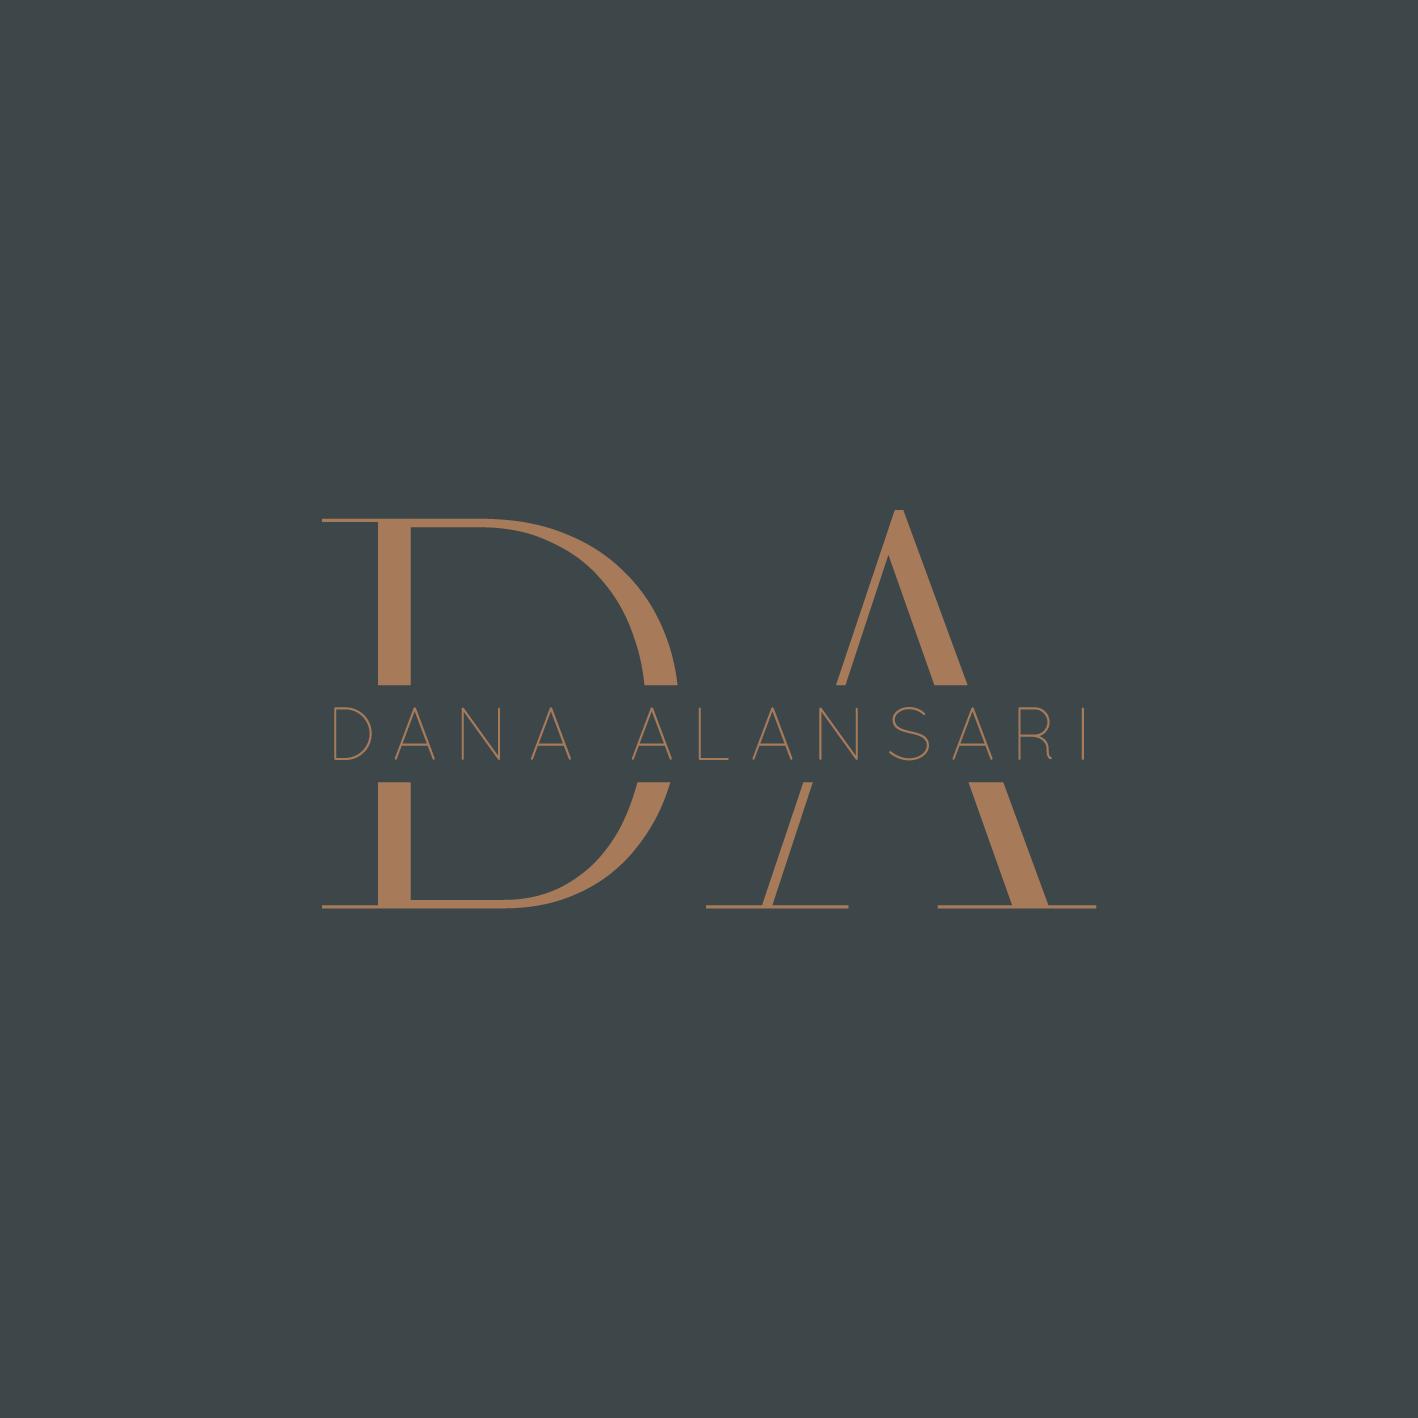 By Dana Alansari